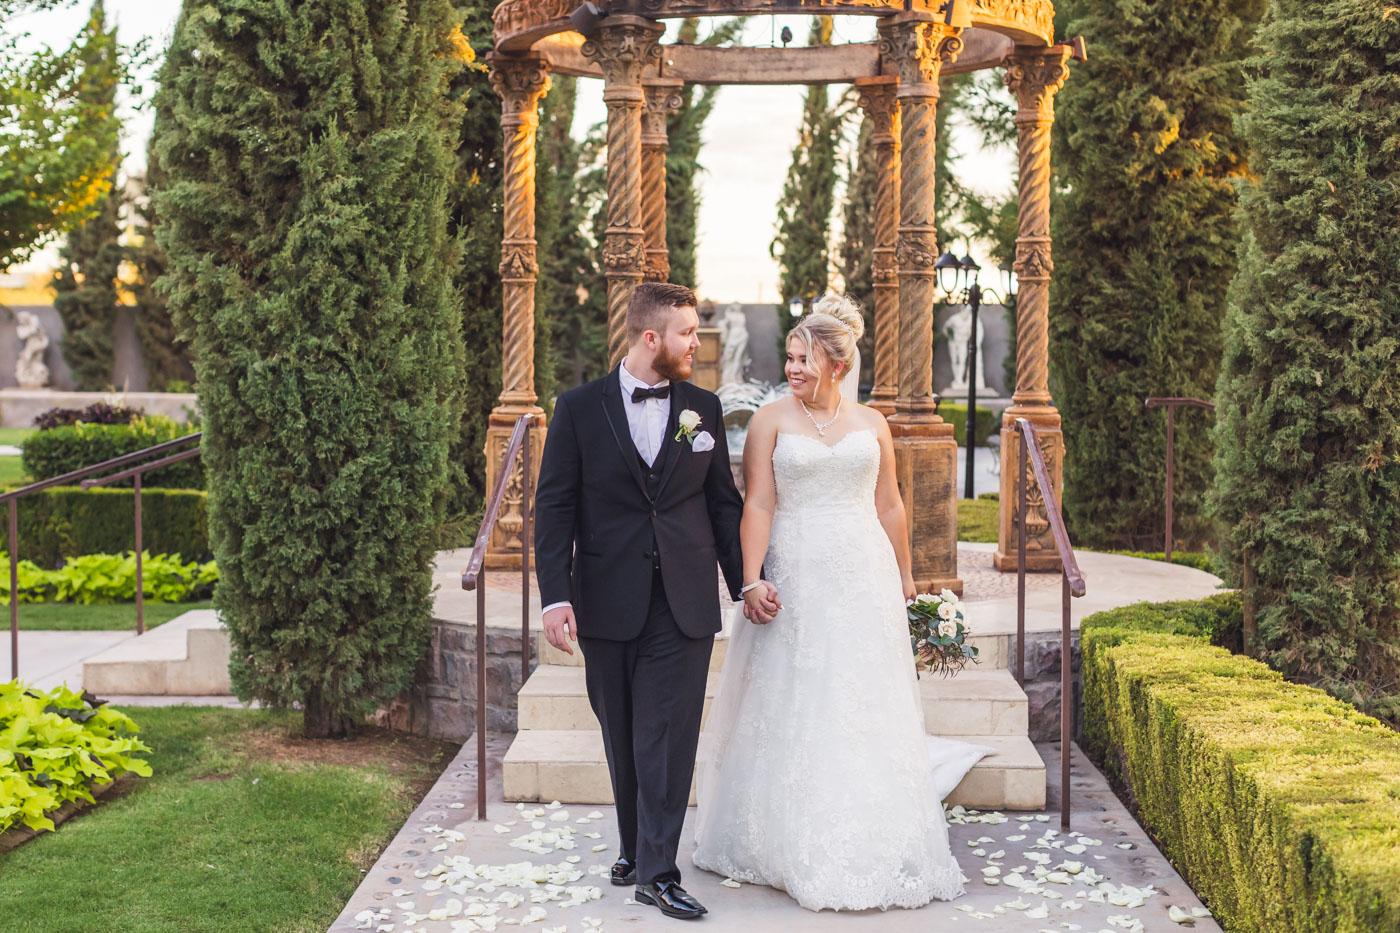 aaron-kes-photography-ashley-castle-wedding-20.jpg